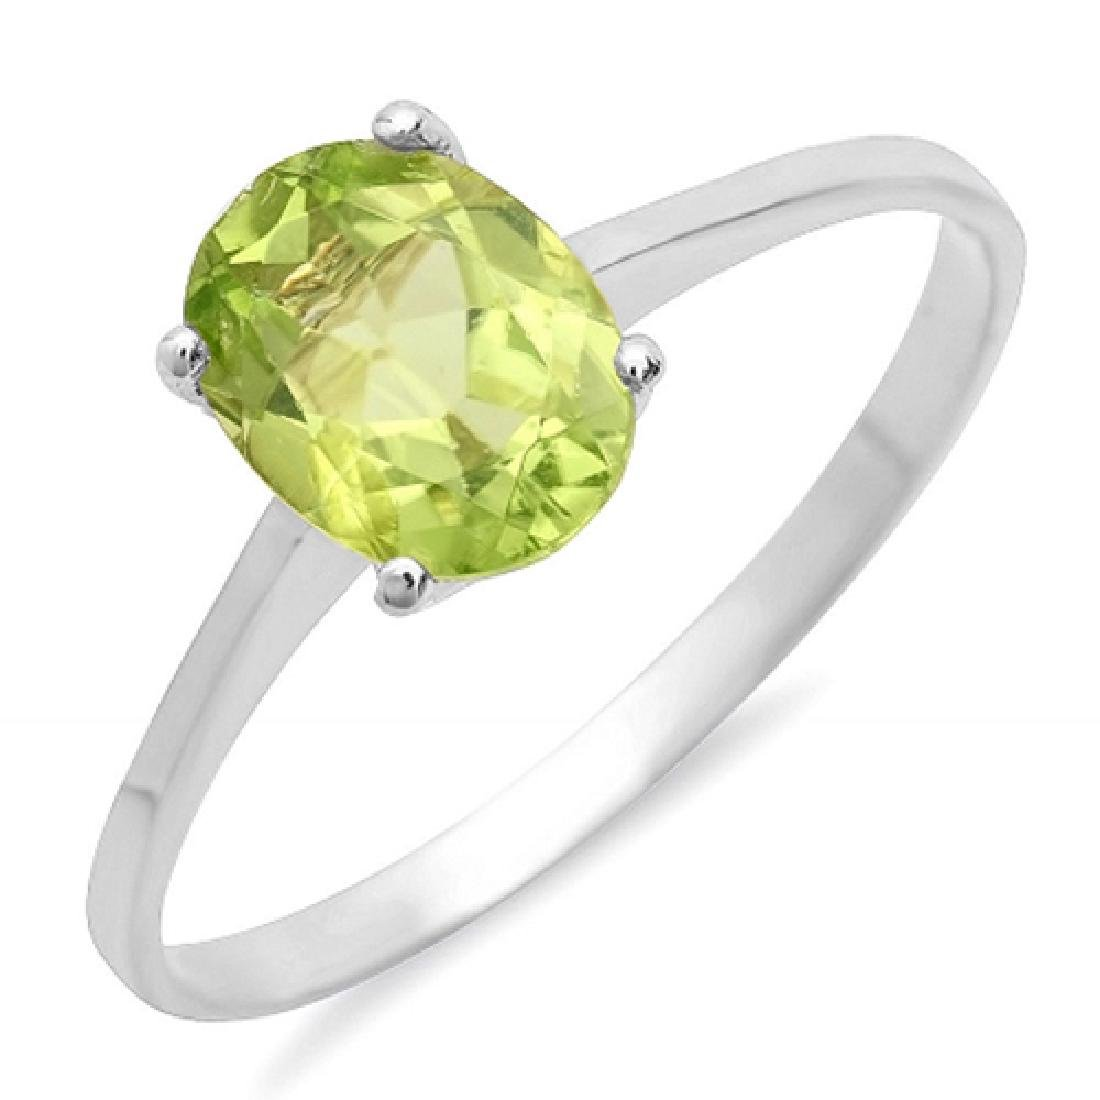 1.00 Carat Natural Peridot 18K Solid White Gold Ring